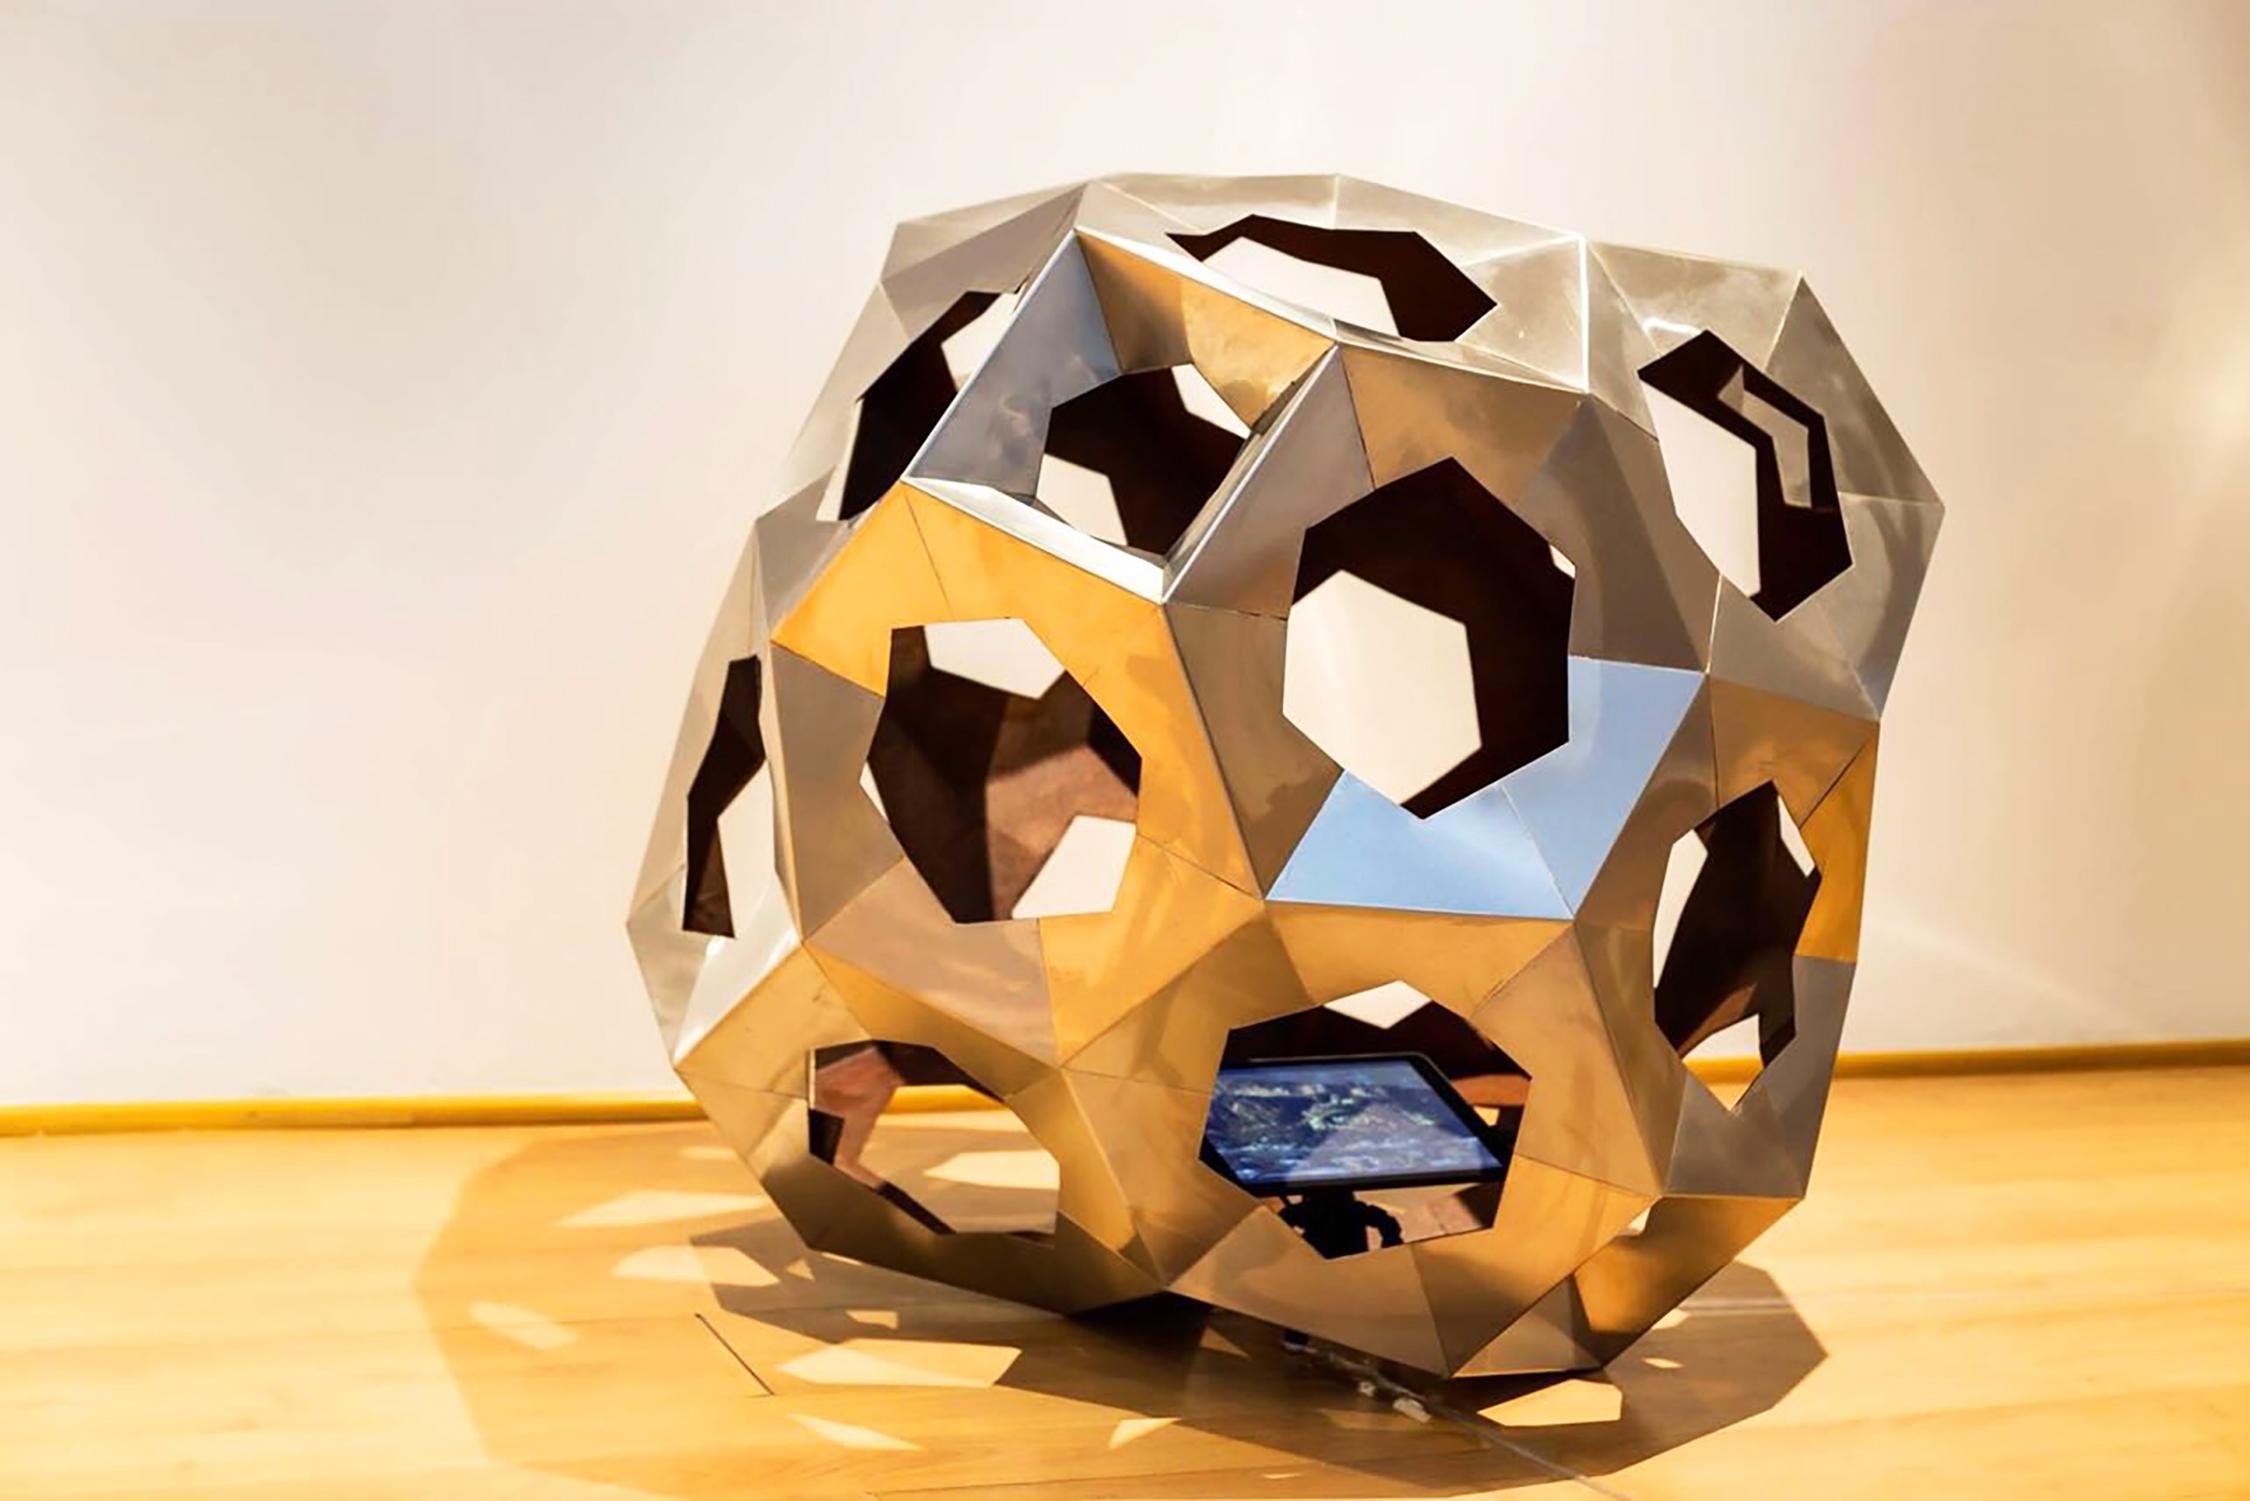 2 Ecosistema Cubo.jpg